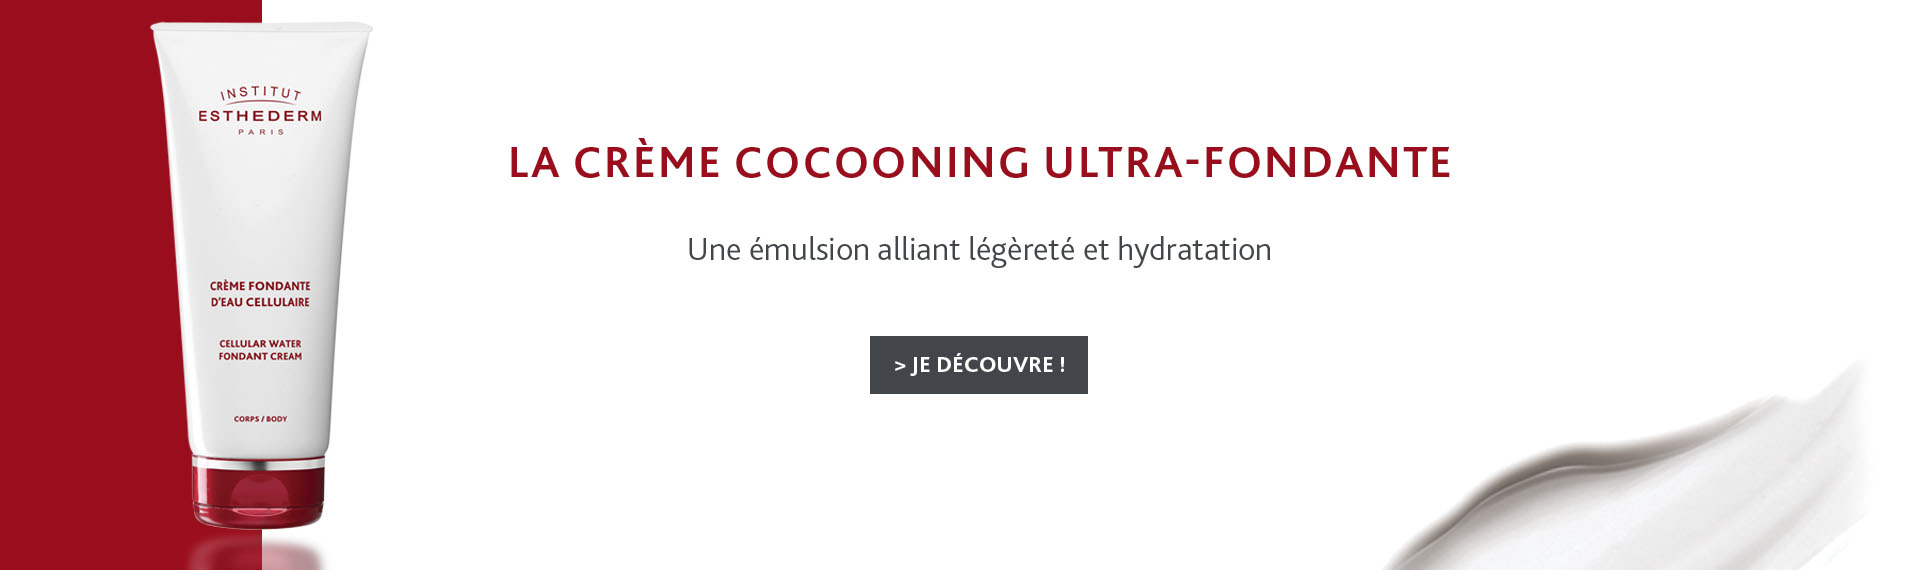 La crème cocooning ultra-fondante